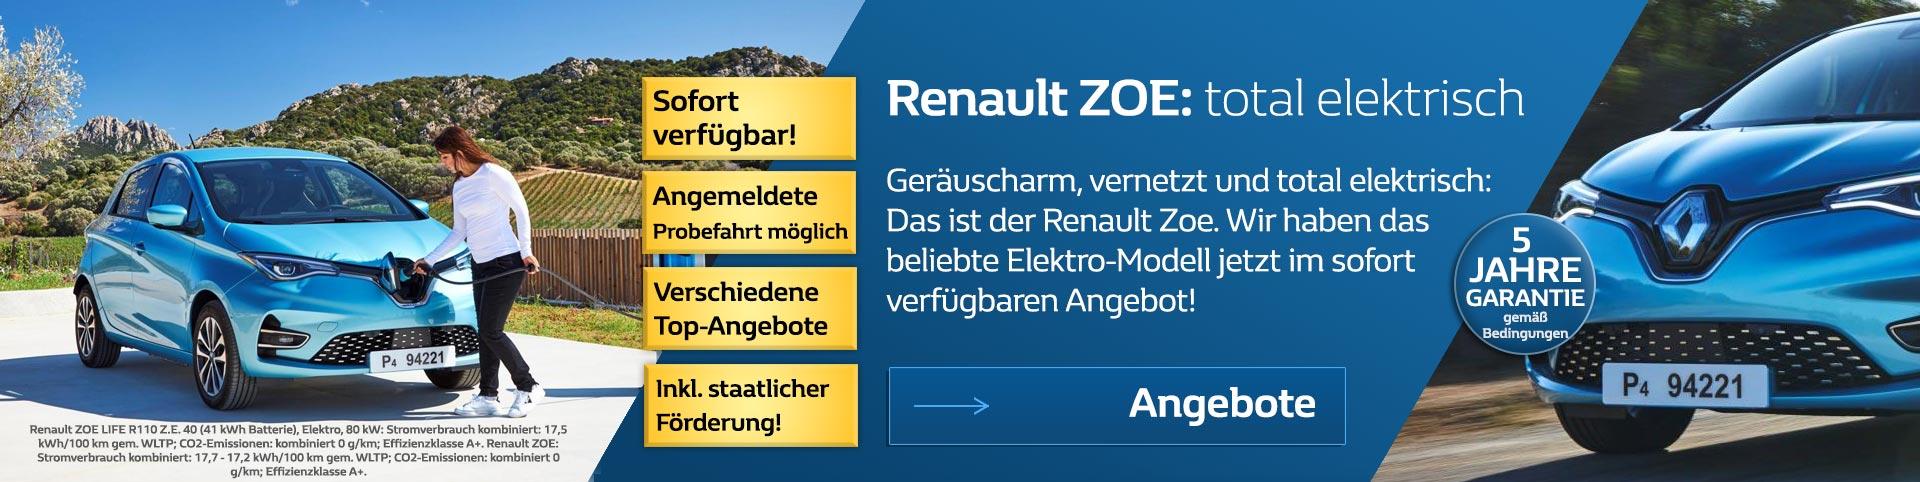 Renault Zoe 2019 vom Autozentrum P&A-PRECKEL